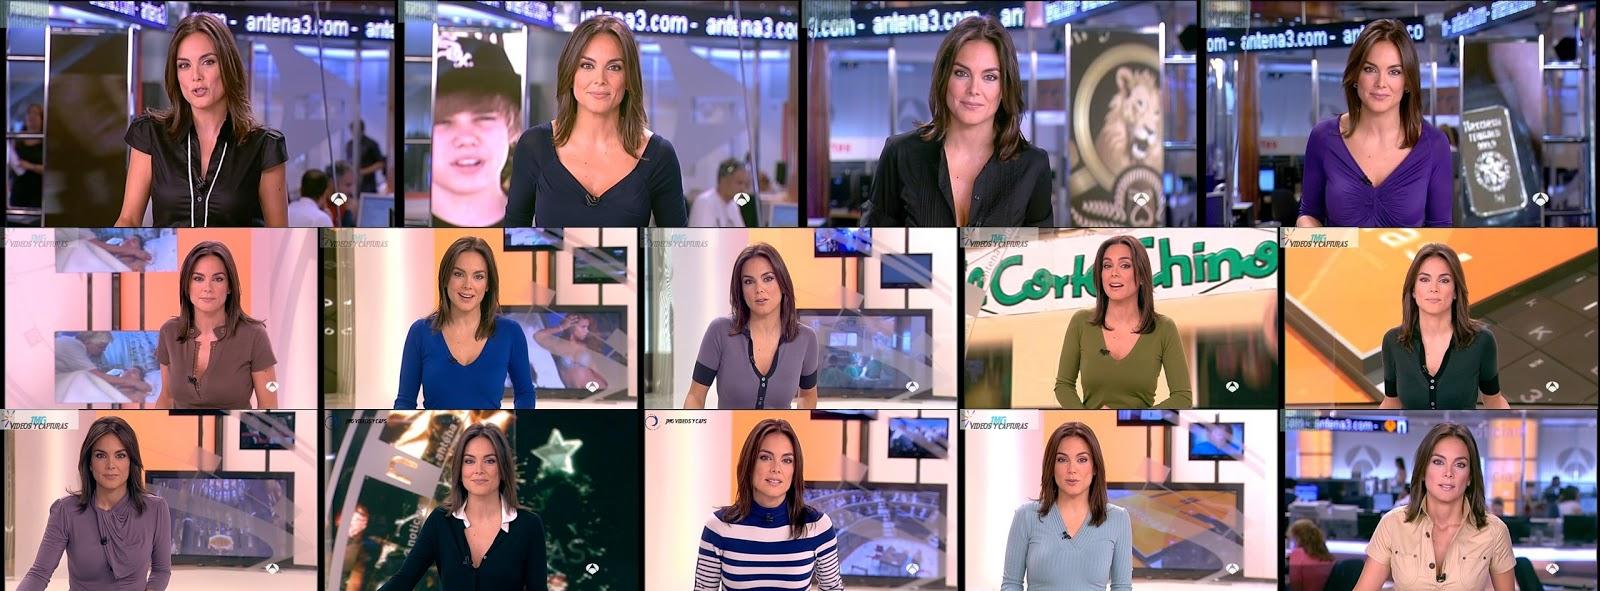 MONICA CARRILLO, RECOPILATORIO, VIDEOS 2010 & 2011 (92 VIDEOS)